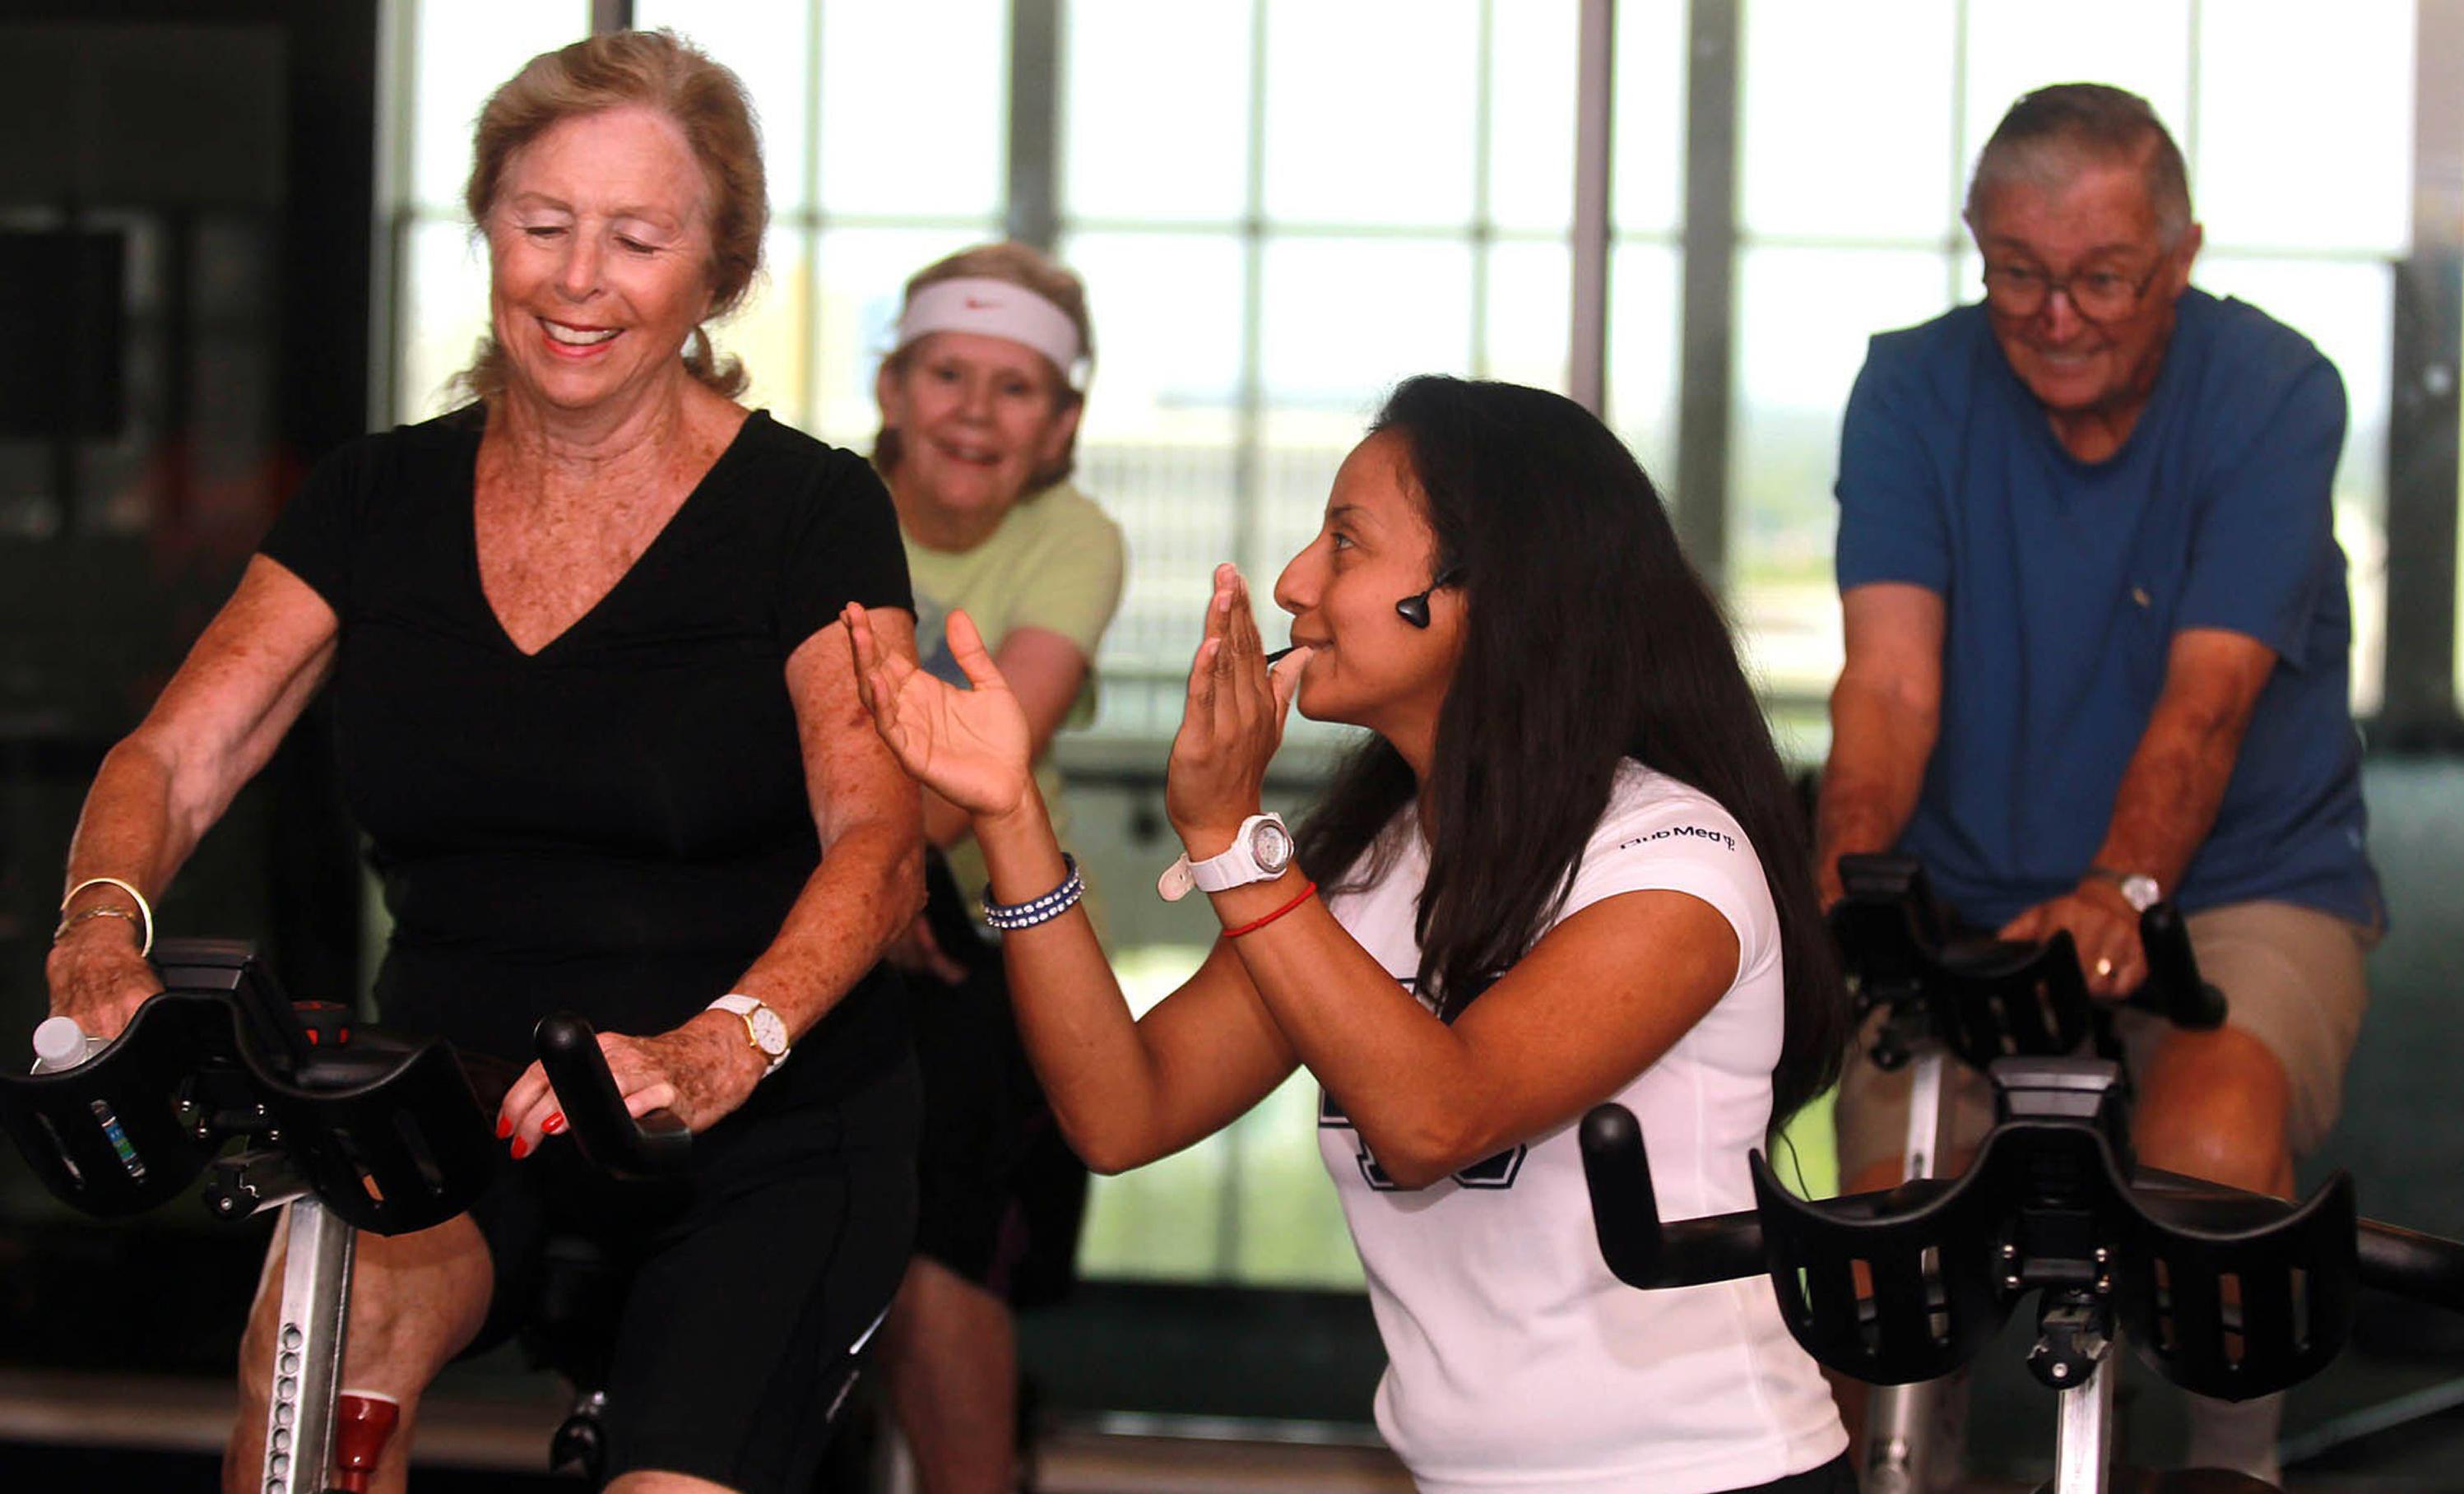 Angela Alvarado exercise fights parkinson's symptoms | the spokesman-review